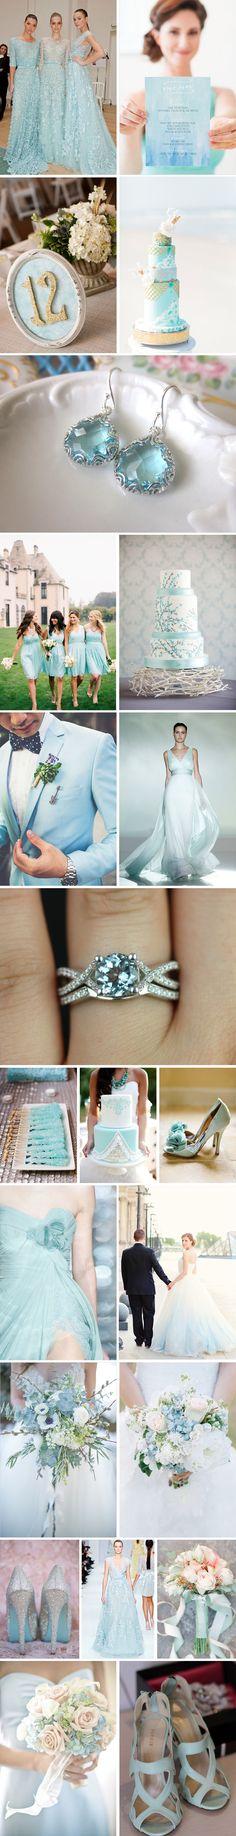 aquamarine wedding color inspiration #FeltNoir #Aquamarine #MarchBirthstone